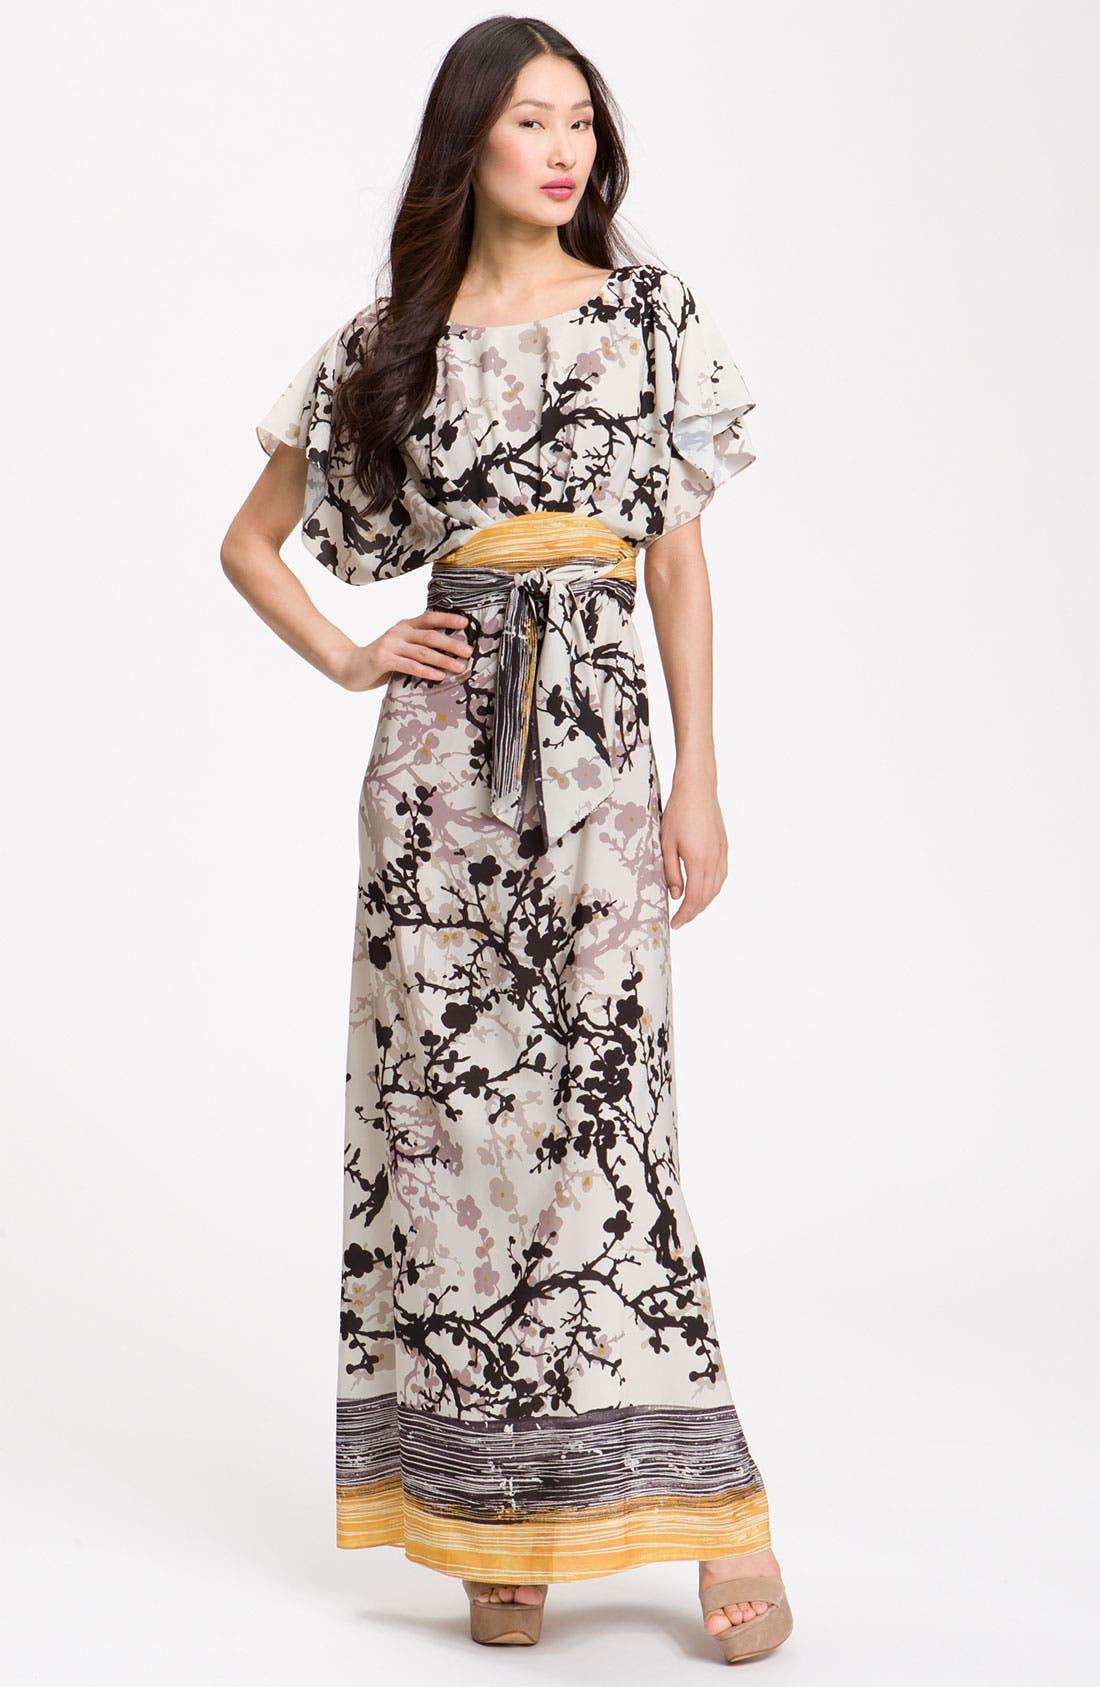 Alternate Image 1 Selected - Suzi Chin for Maggy Boutique Crêpe de Chine Maxi Dress